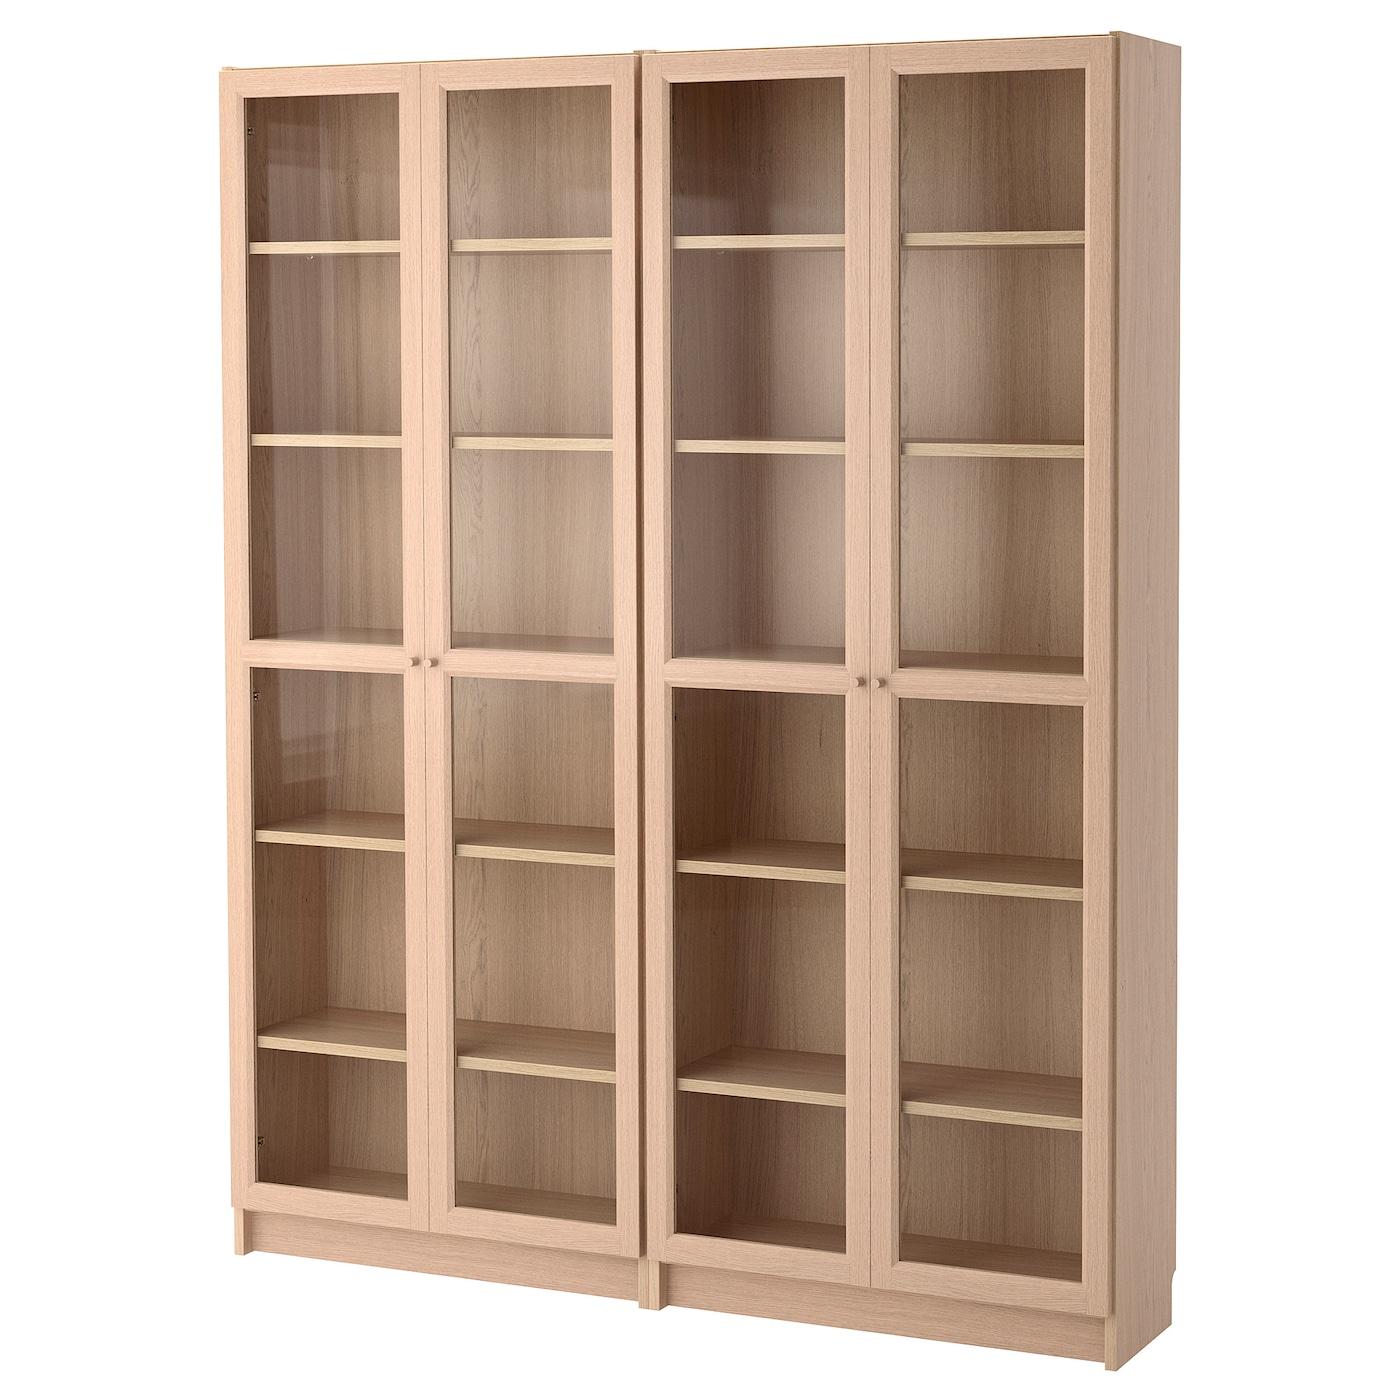 Boekenkasten - IKEA